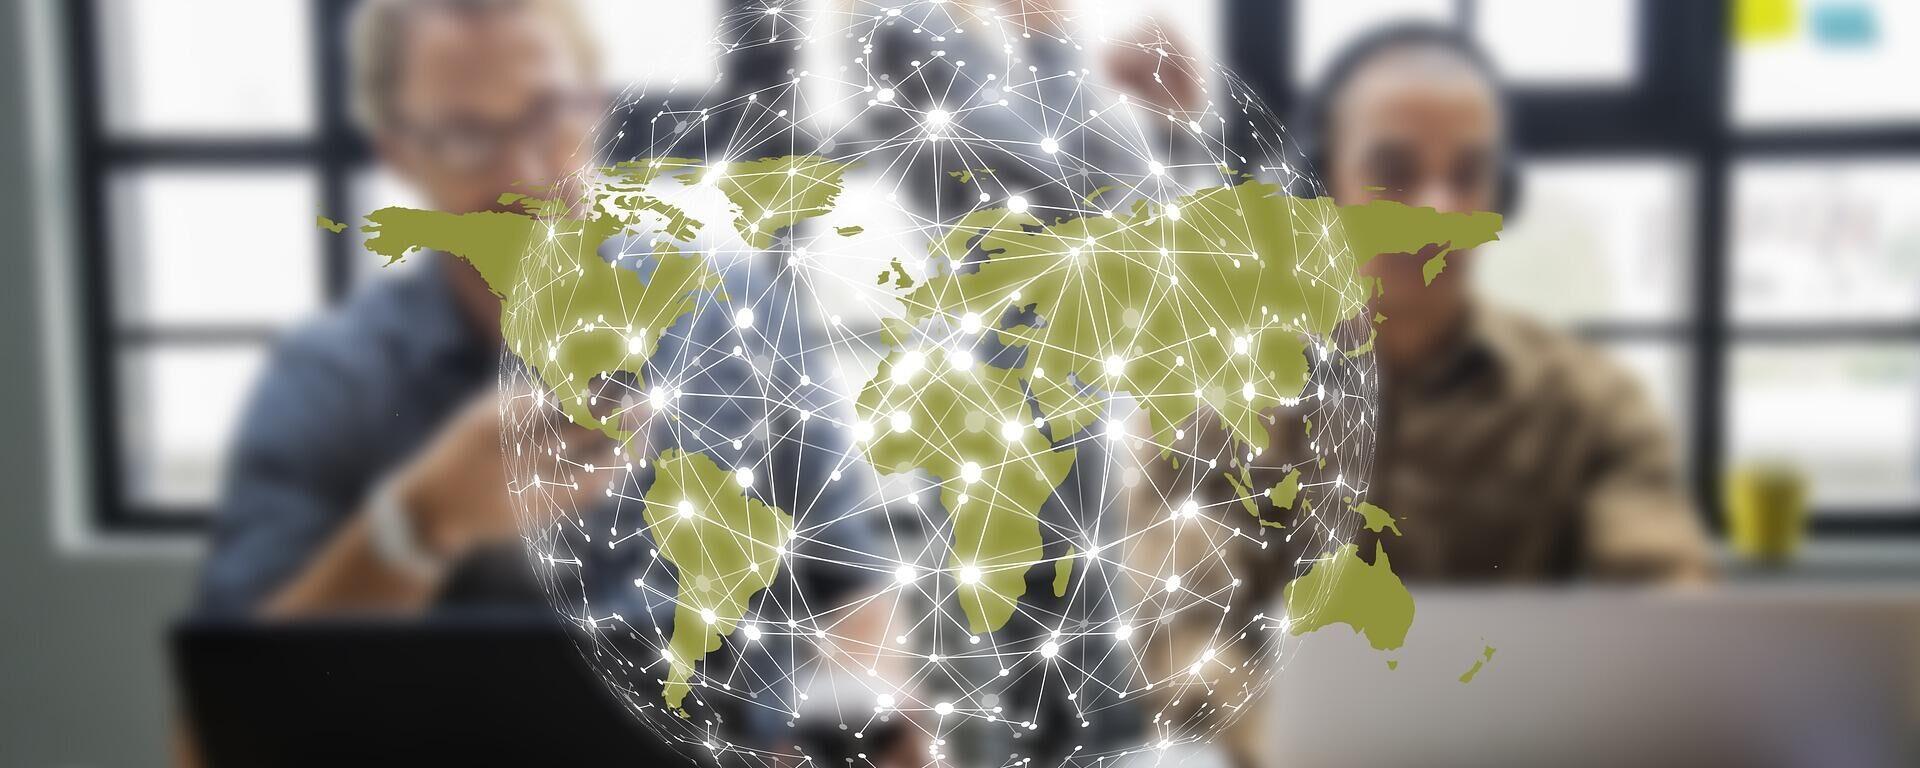 Ciberseguridad (imagen referencial) - Sputnik Mundo, 1920, 07.03.2021